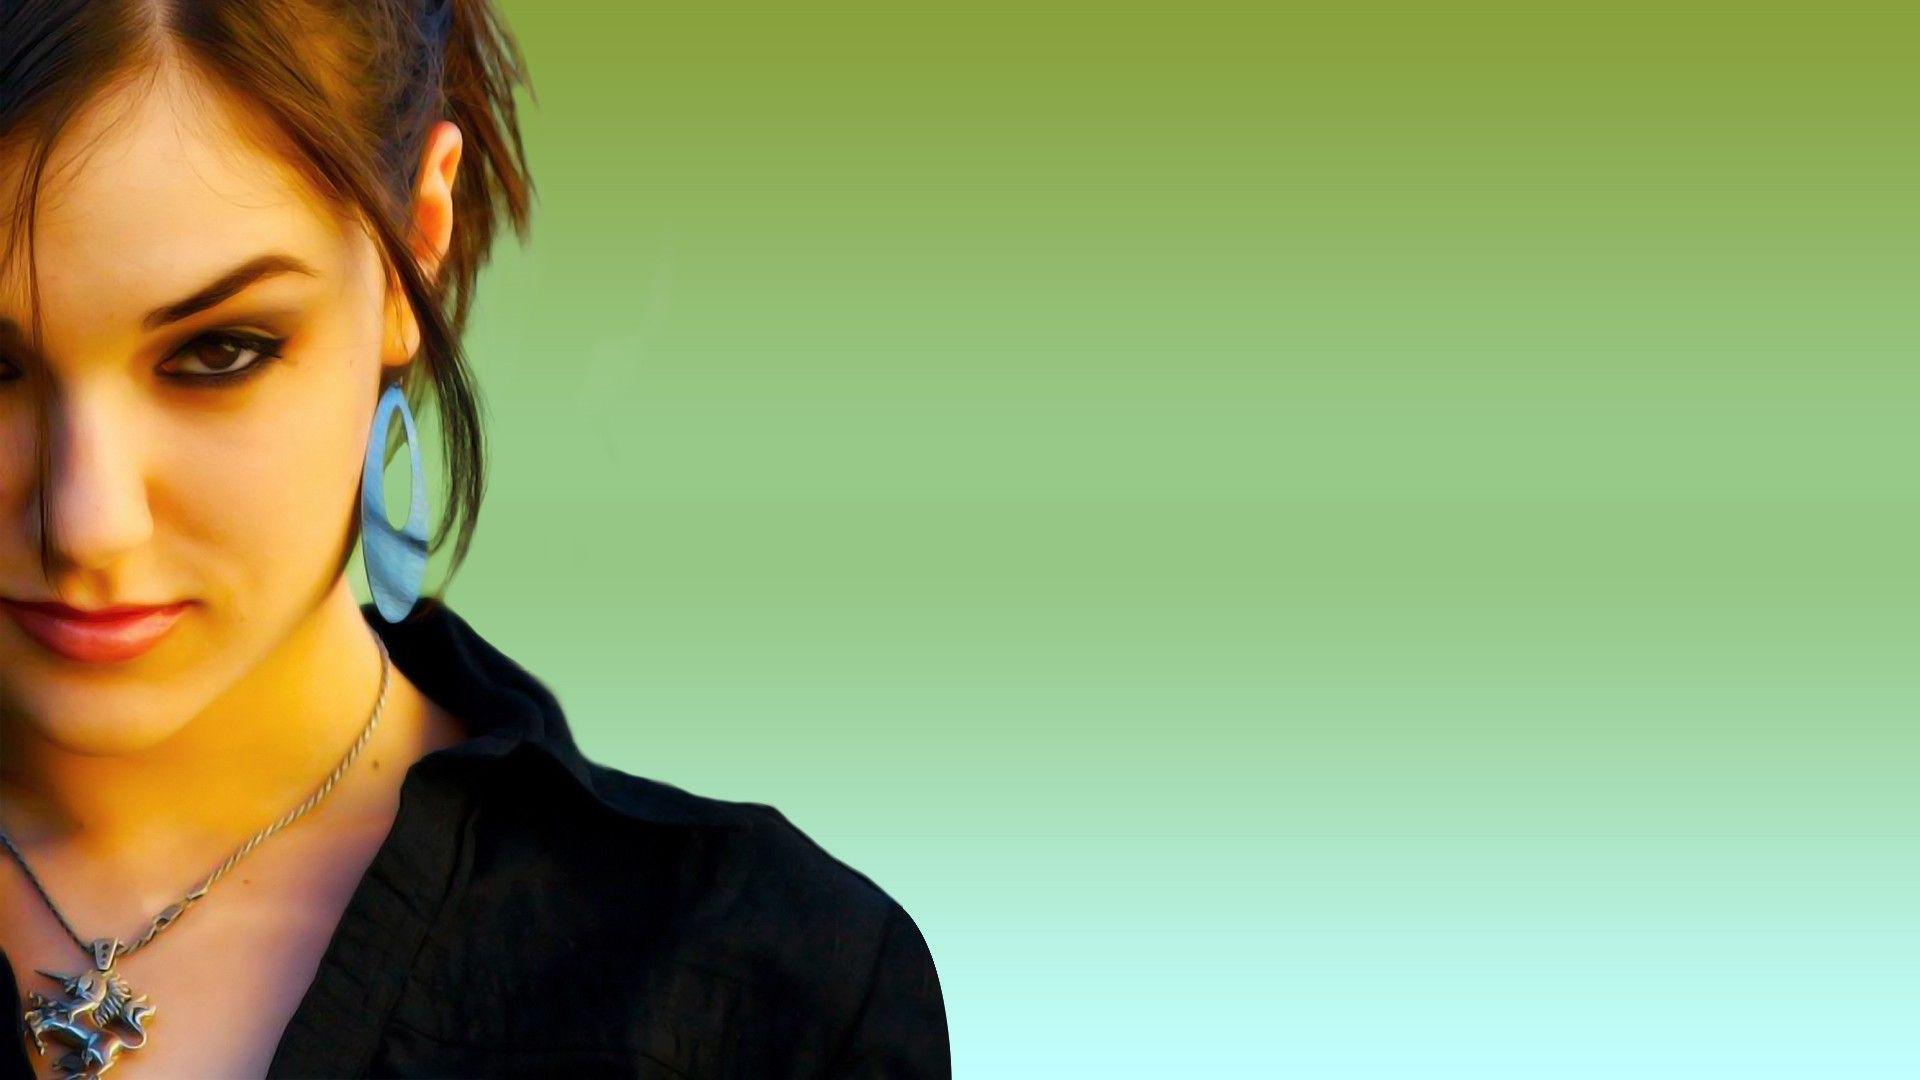 Sasha Grey 1080p HD Wallpaper Girls